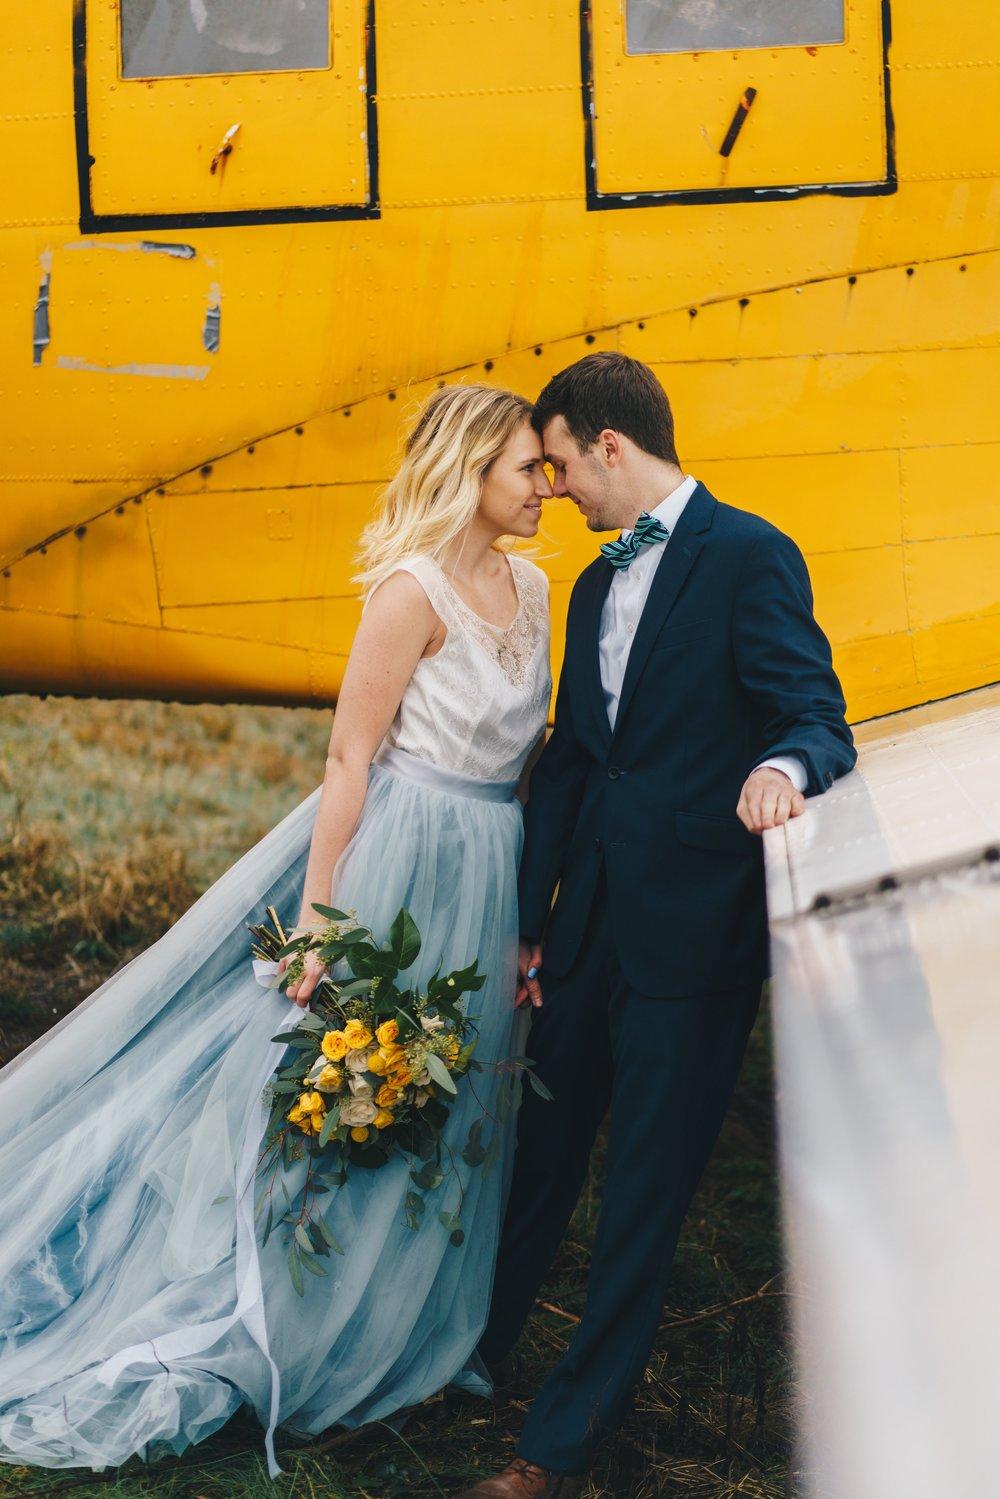 Franklin, Tennessee Wedding Photographer